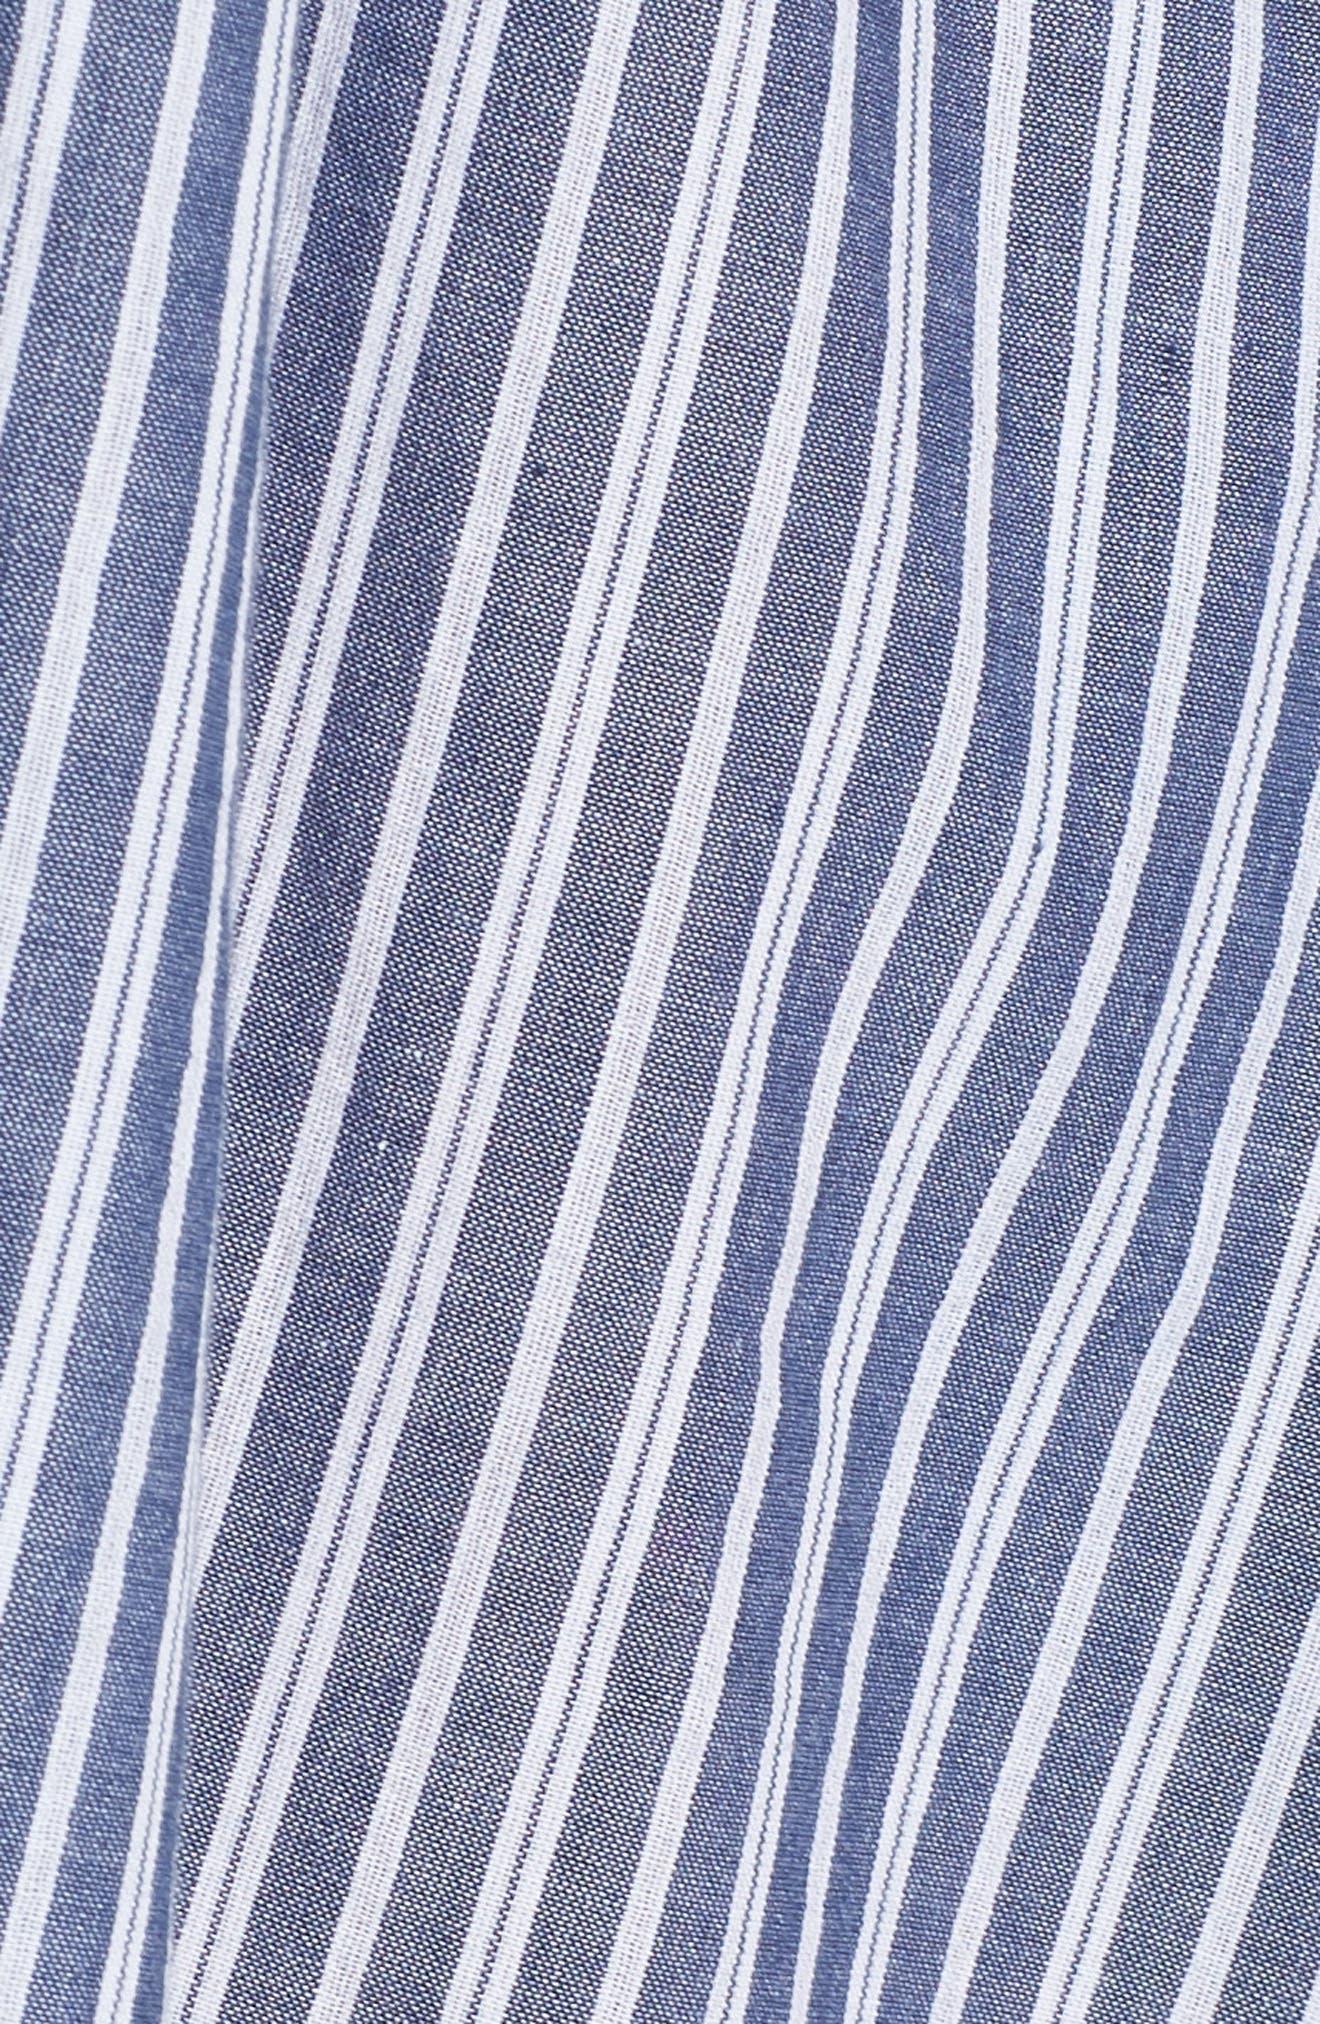 Tatus Stripe Drawstring Cotton Shirtdress,                             Alternate thumbnail 6, color,                             452